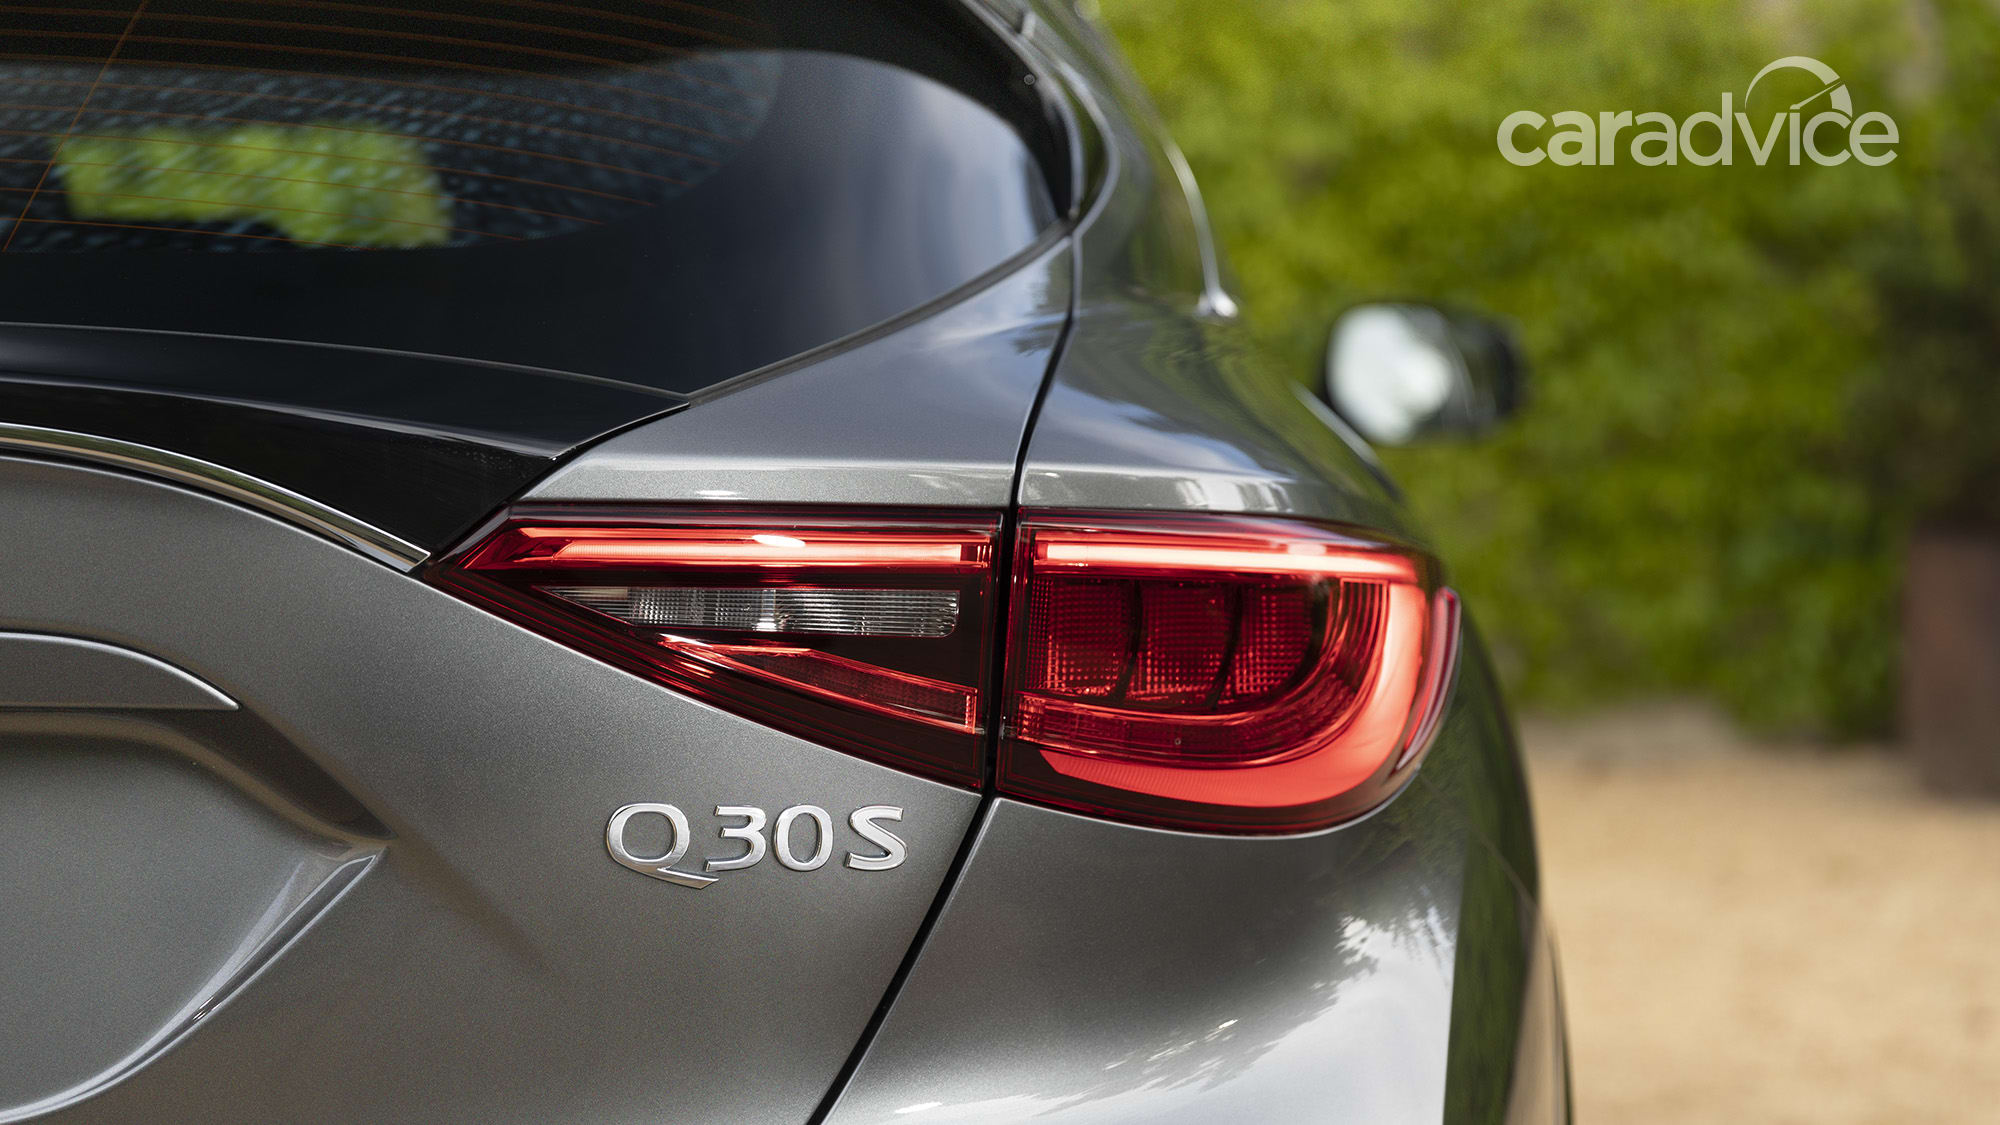 2019 Infiniti Q30, QX30 pricing and specs | CarAdvice